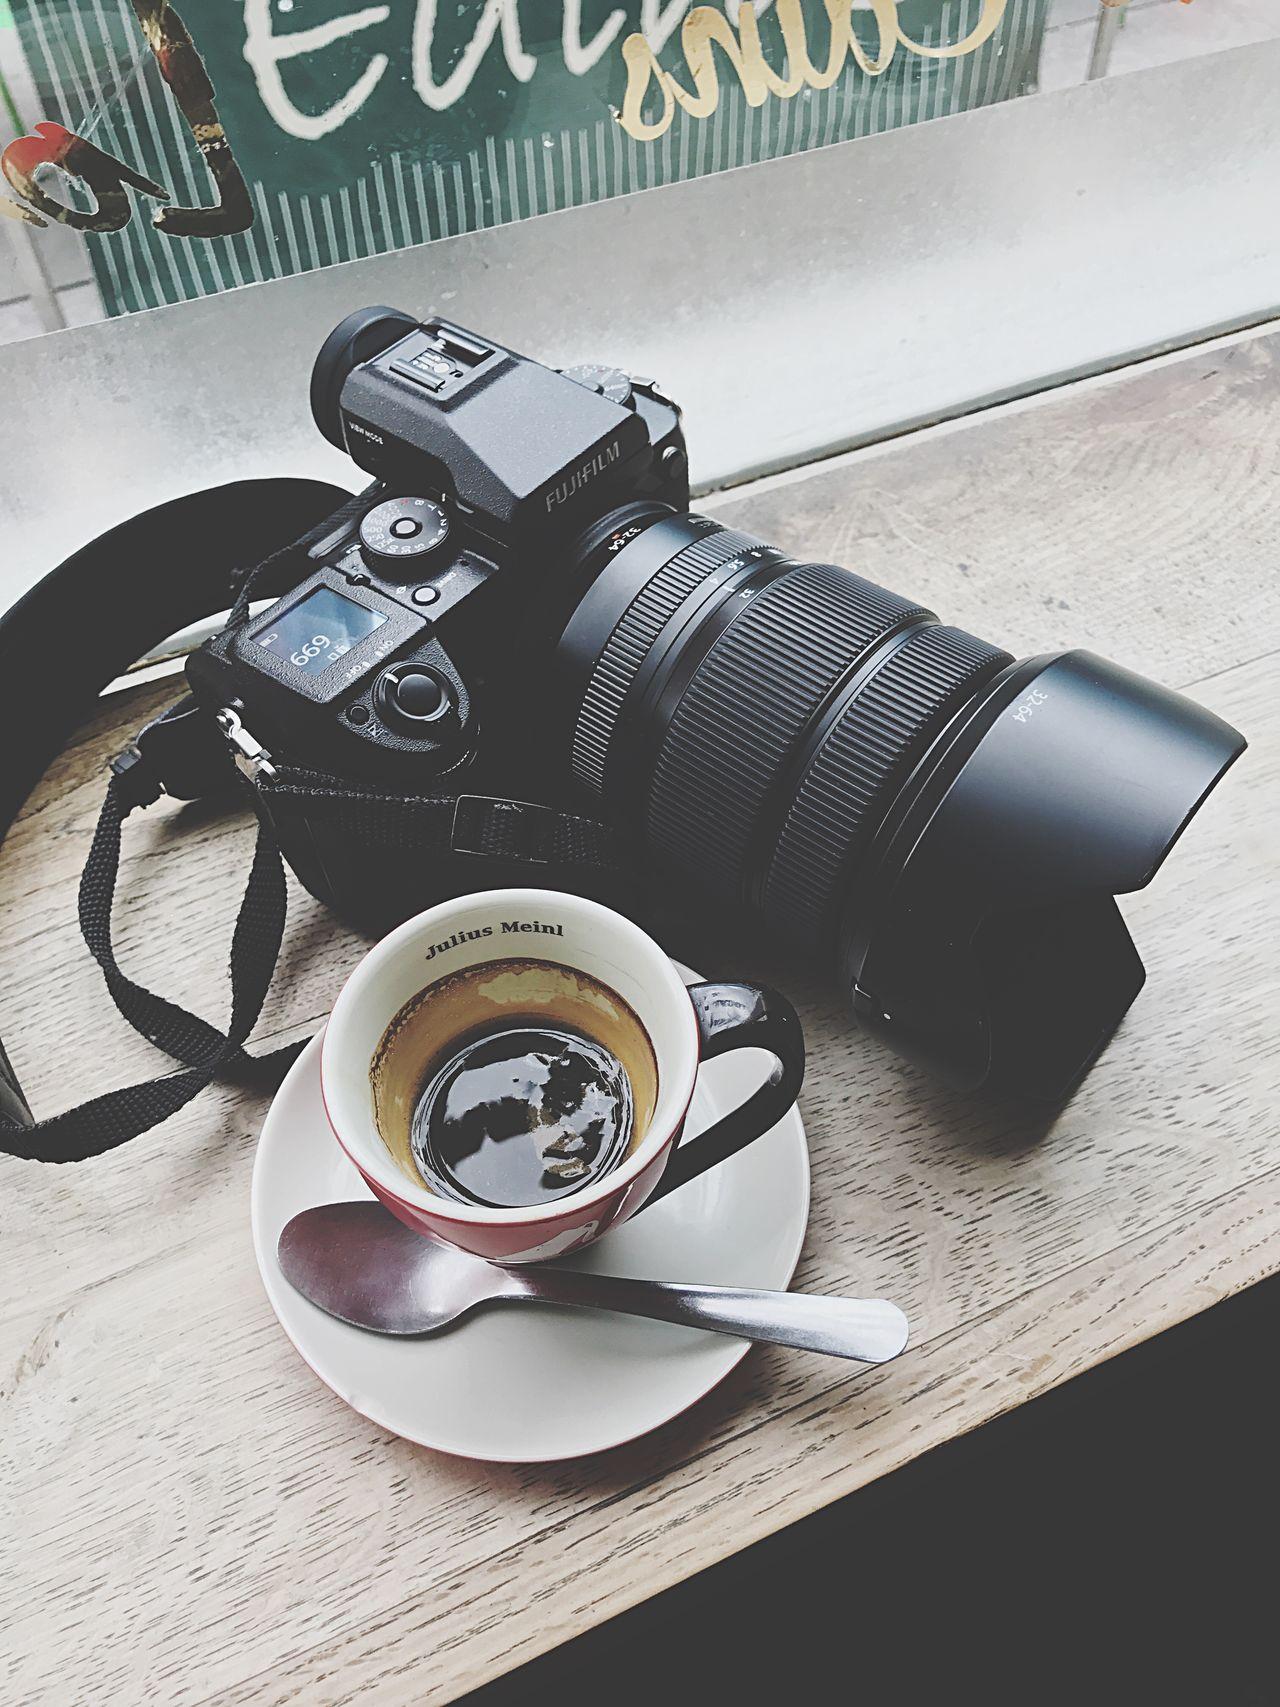 Fujifilm GFX50s and espresso! Camera - Photographic Equipment Photographing Fujifilm_xseries Fujifilm Fuji Xphotographer Lifeasphotographer Photography Lifestyle Gfx GFX50s Mediumformat Mediumformatphotography